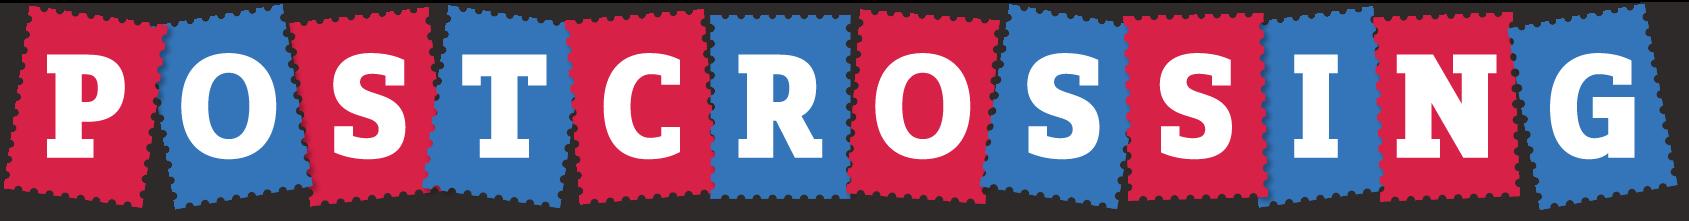 Postcrossing Main Logo